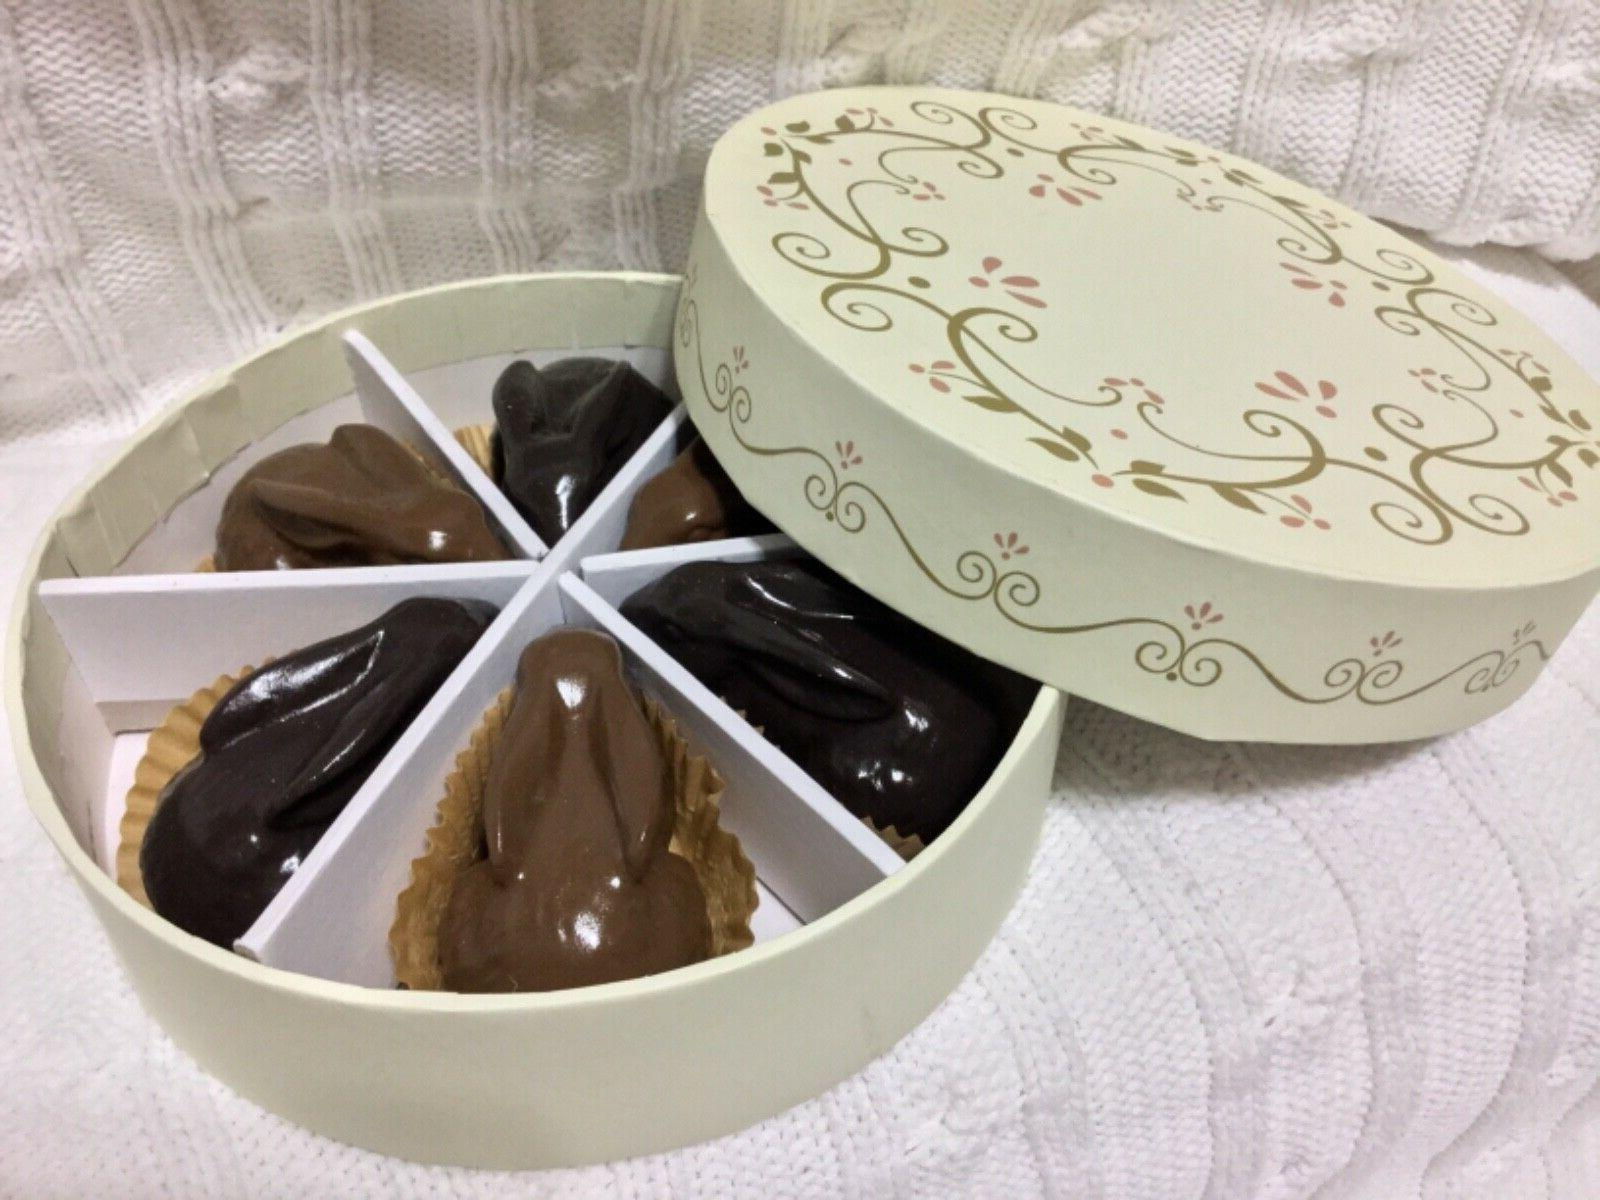 6 IMITATION DARK/MILK CHOCOLATE BOXED DECORATIONS